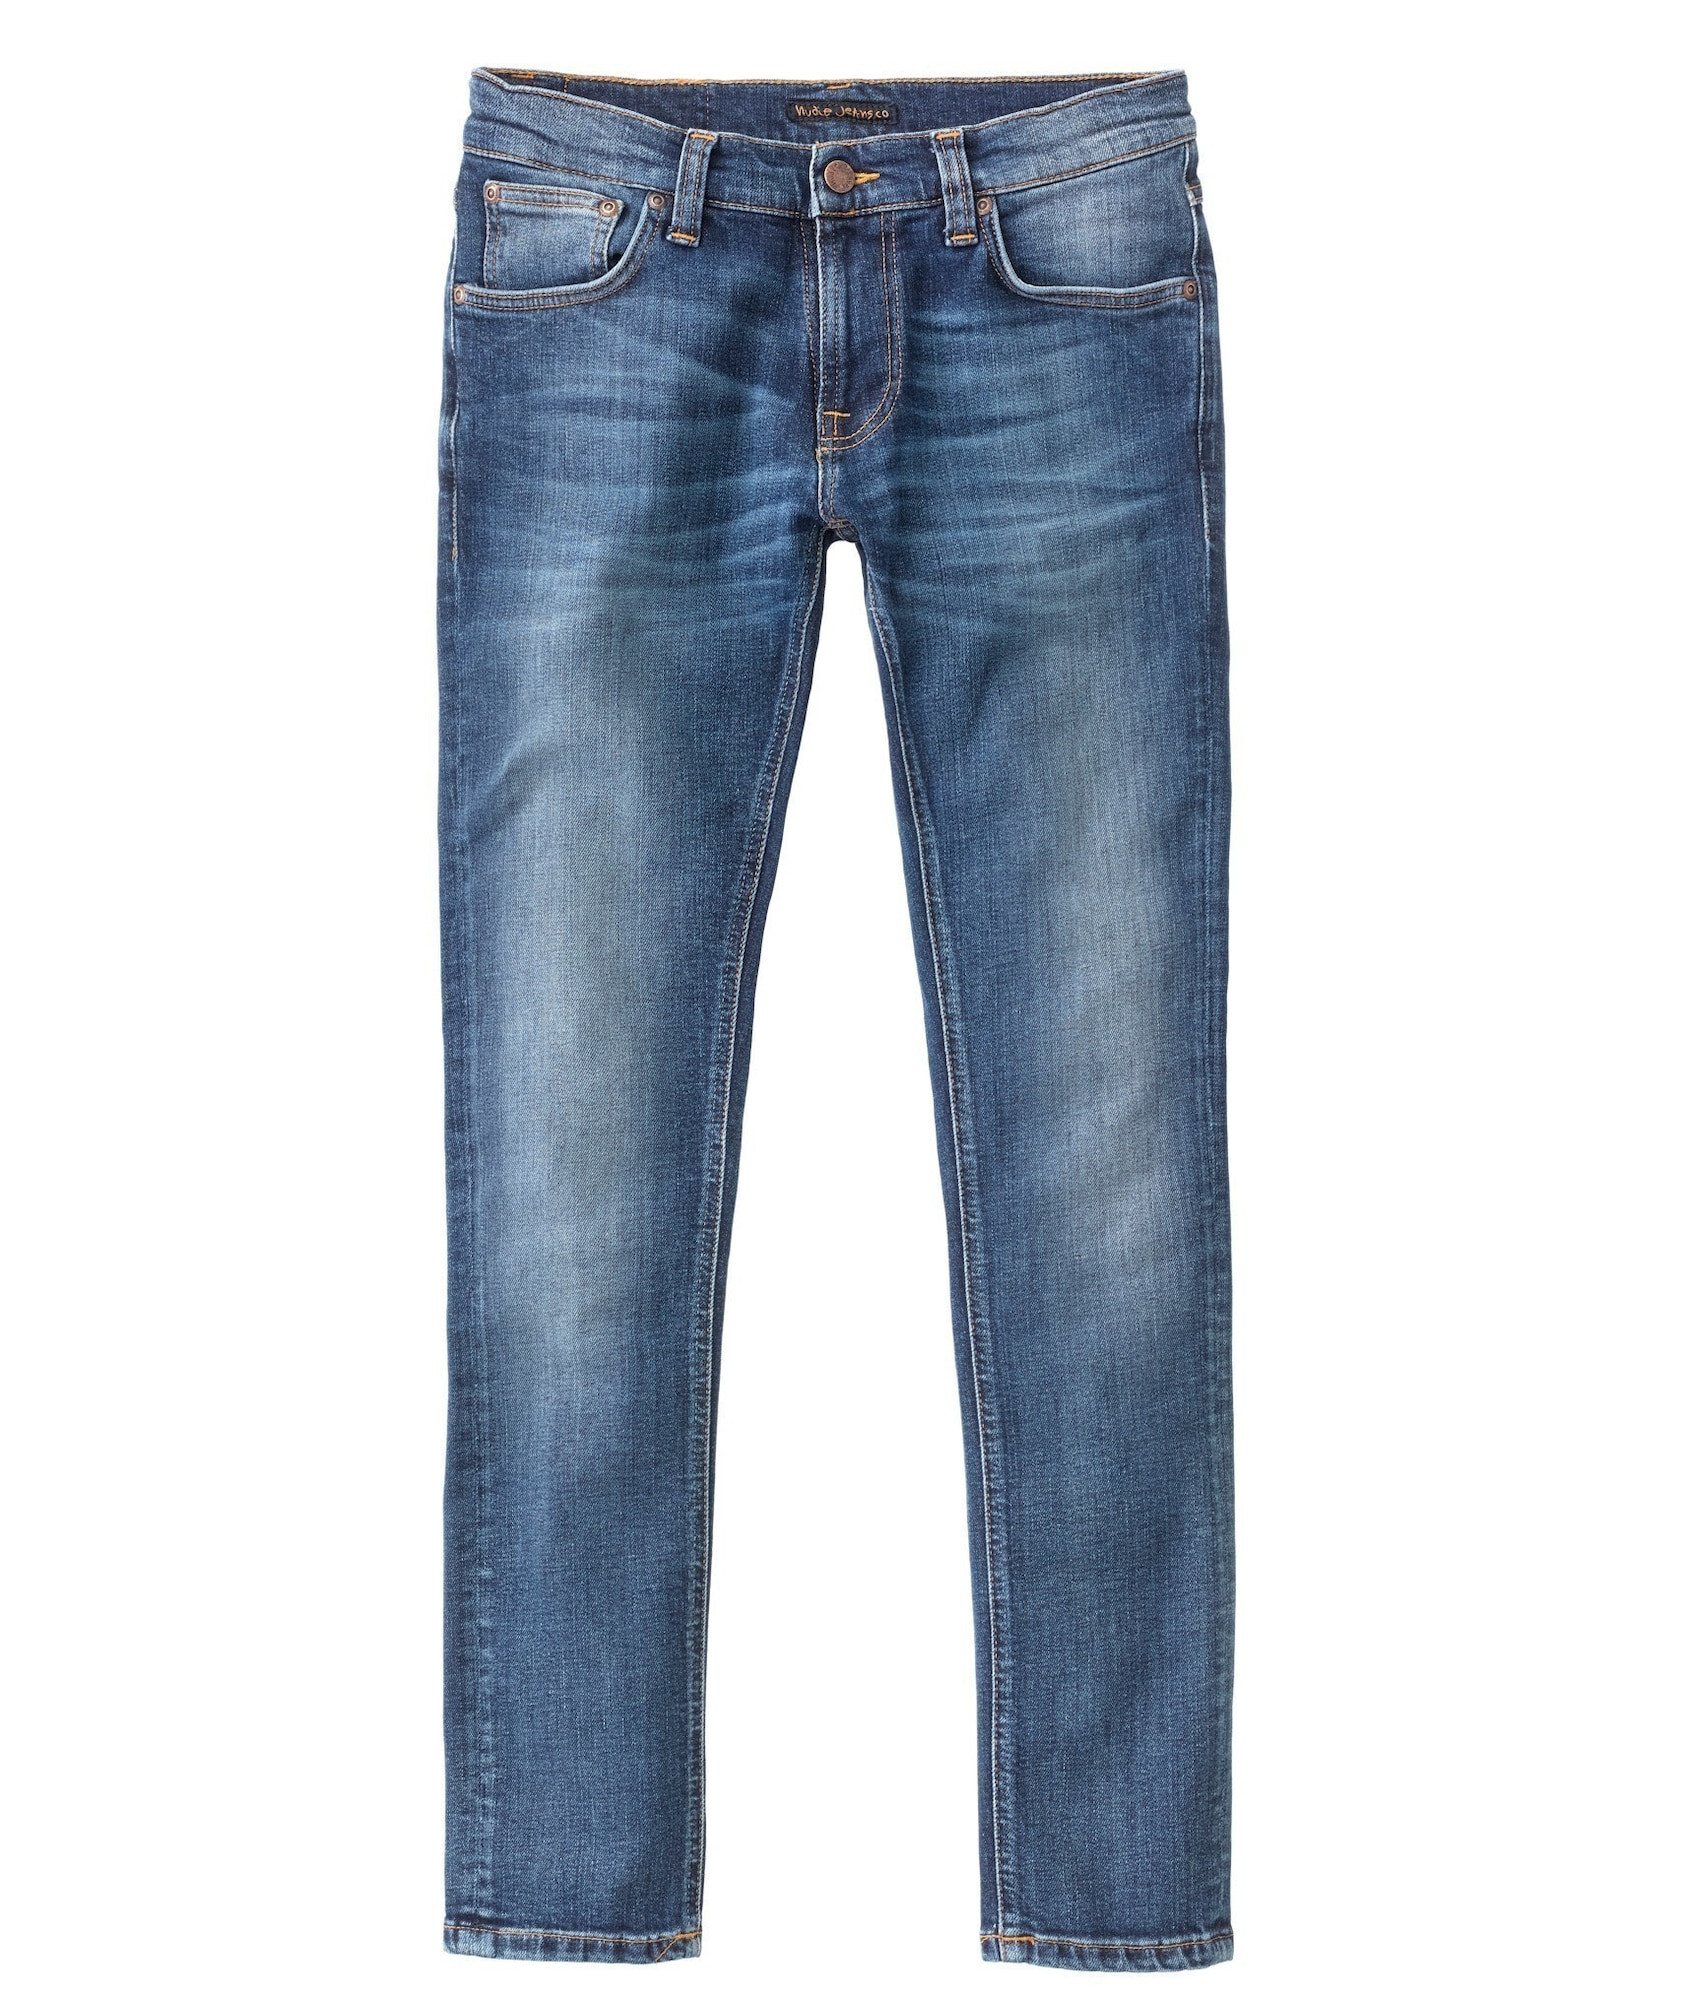 Jeans 'Tight Terry'   Sportbekleidung > Sporthosen > Tights   Nudie Jeans Co